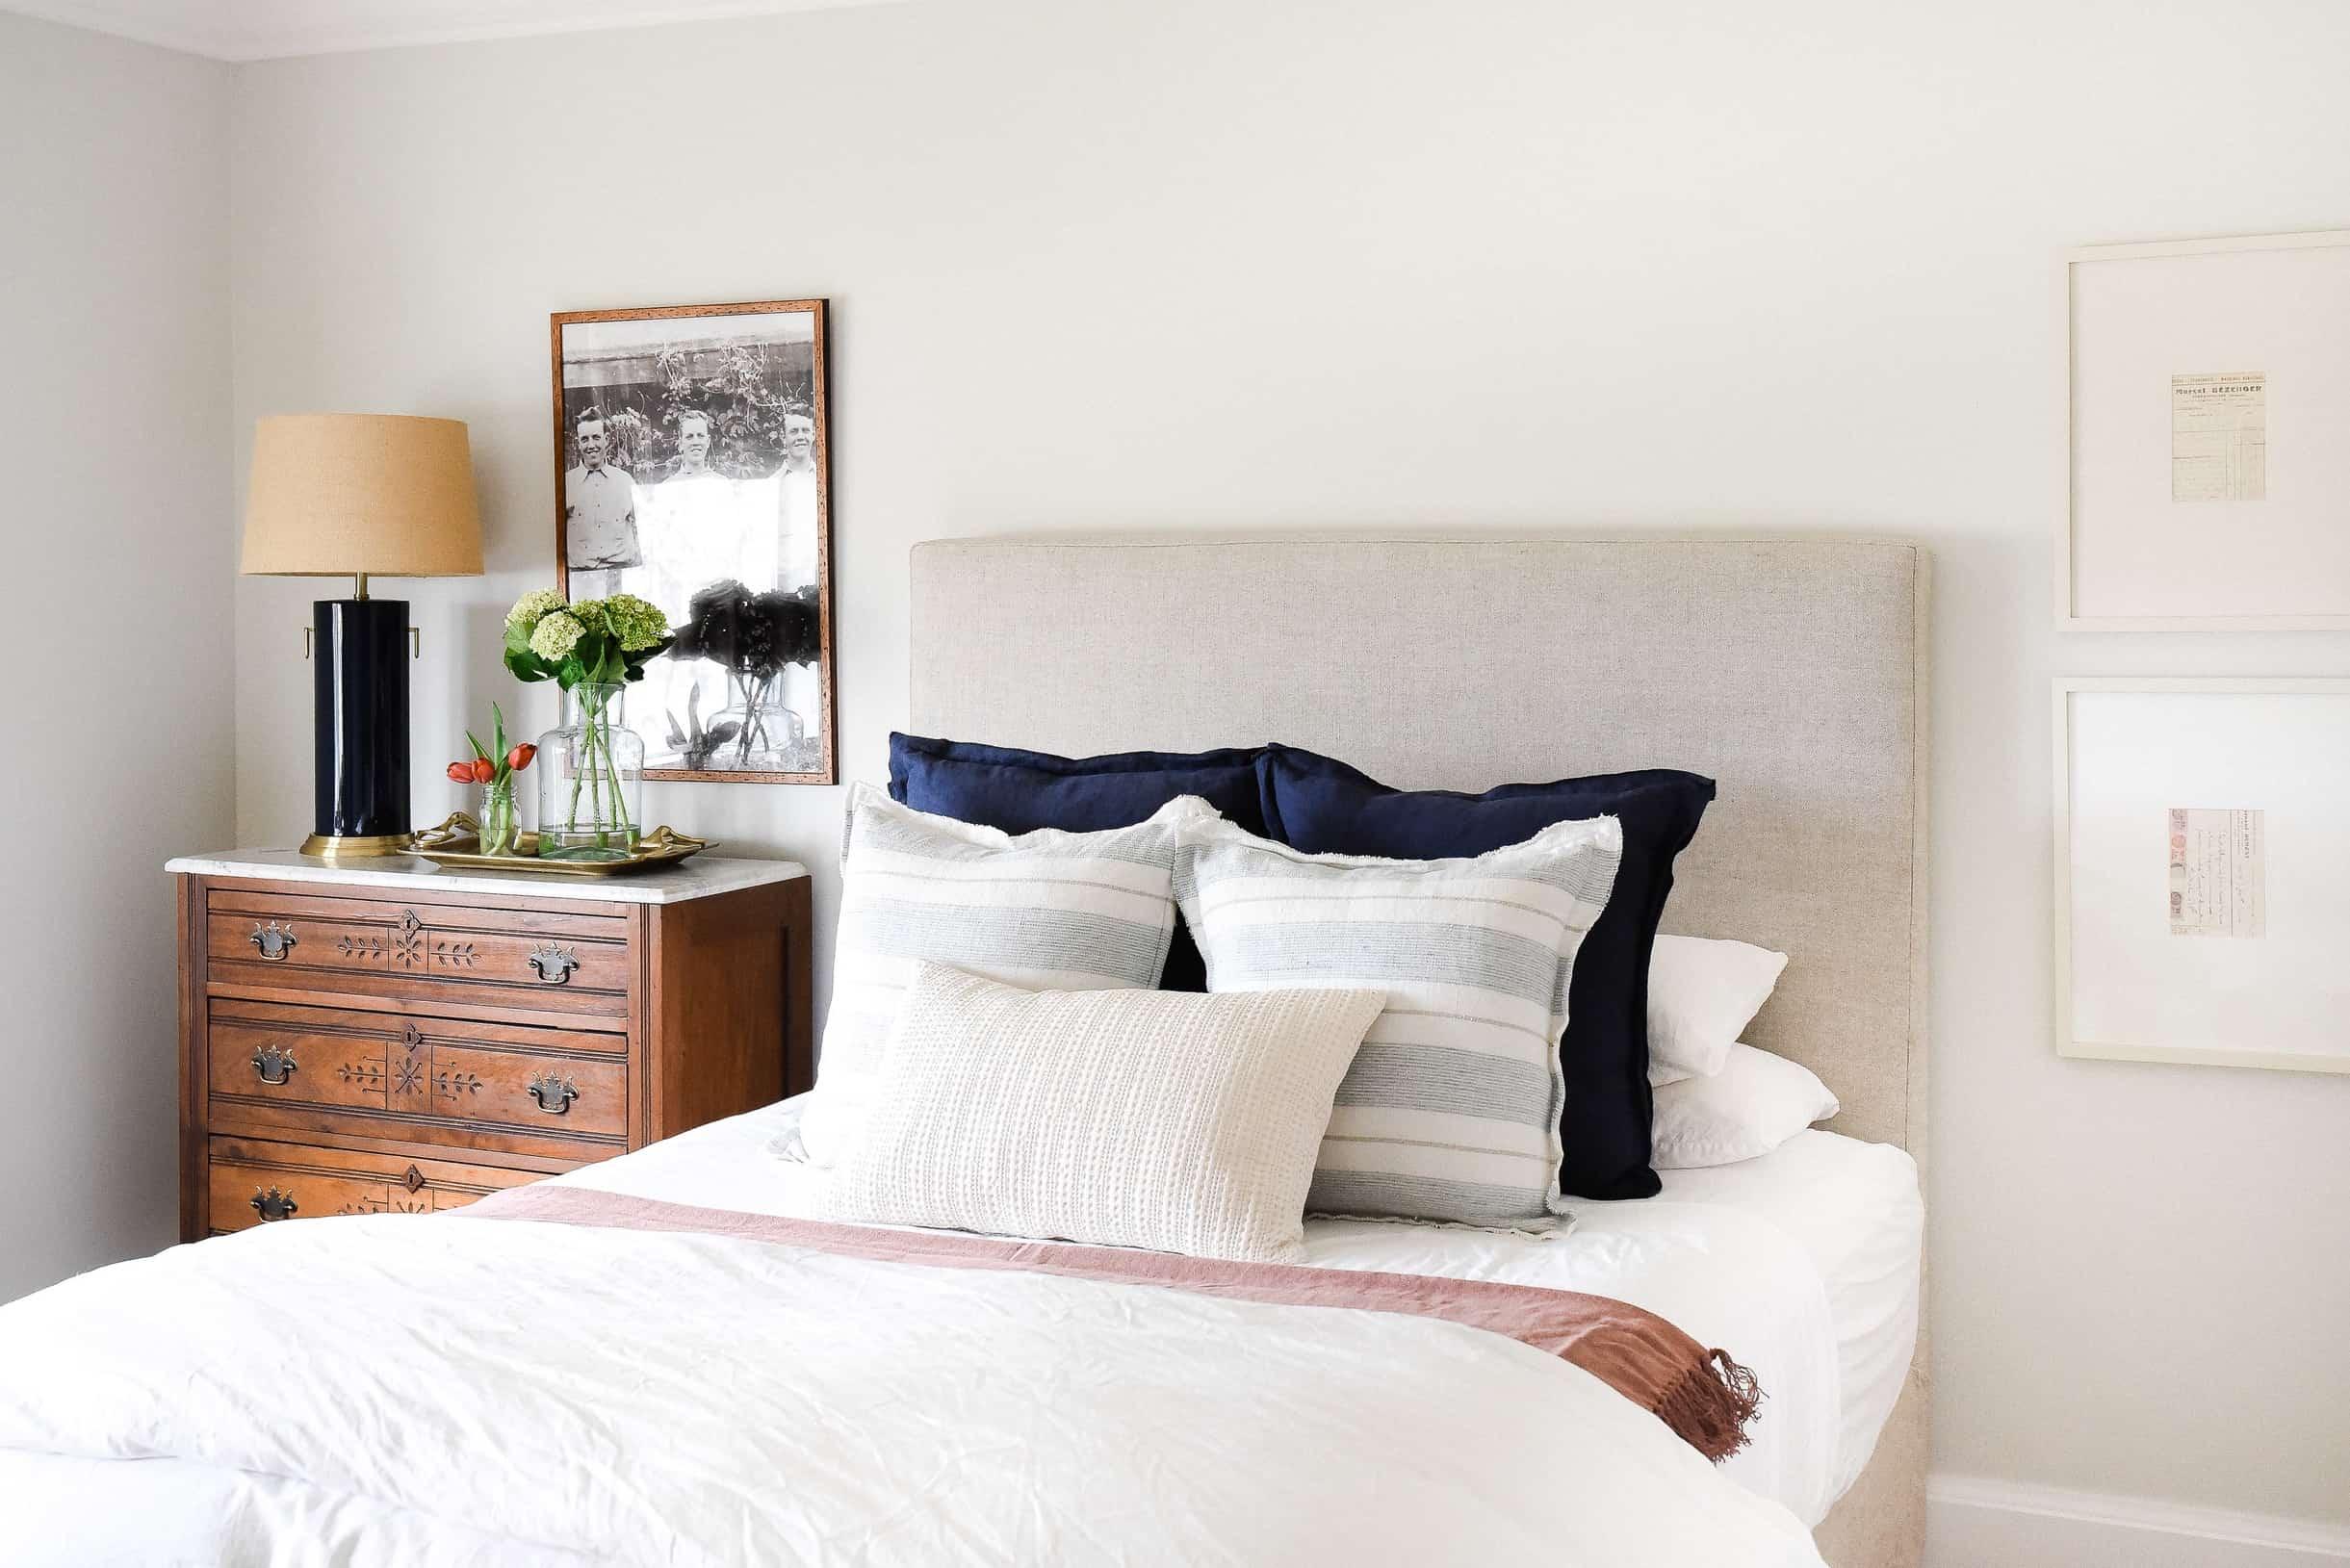 Create a farmhouse bedroom with a mix of antique farmhouse furniture and modern farmhouse decor!